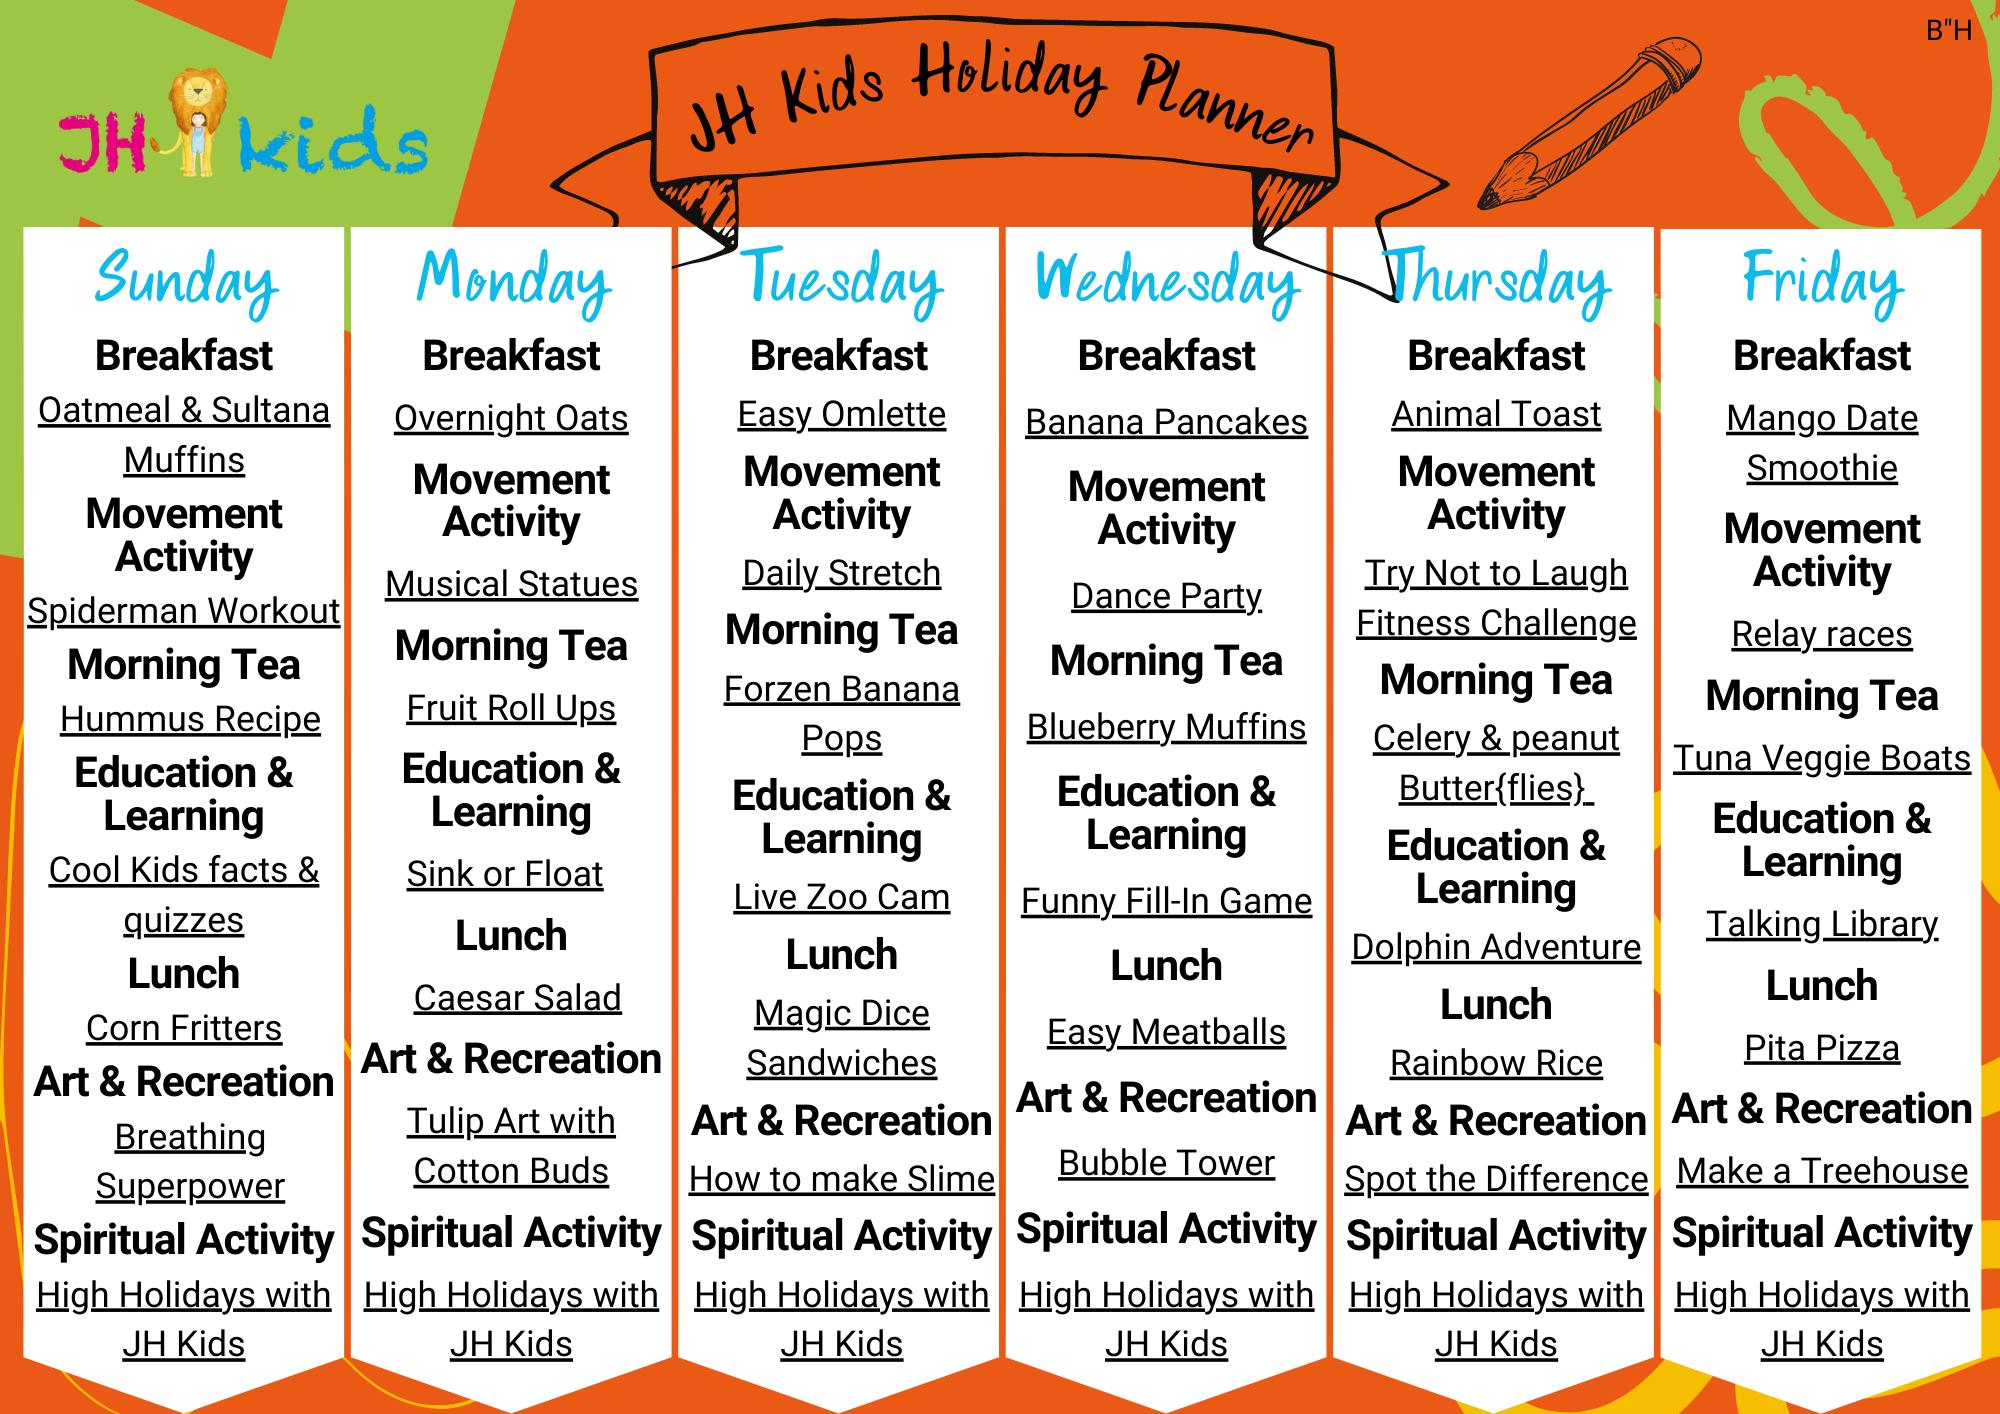 JH Kids Holiday Planner ORANGE